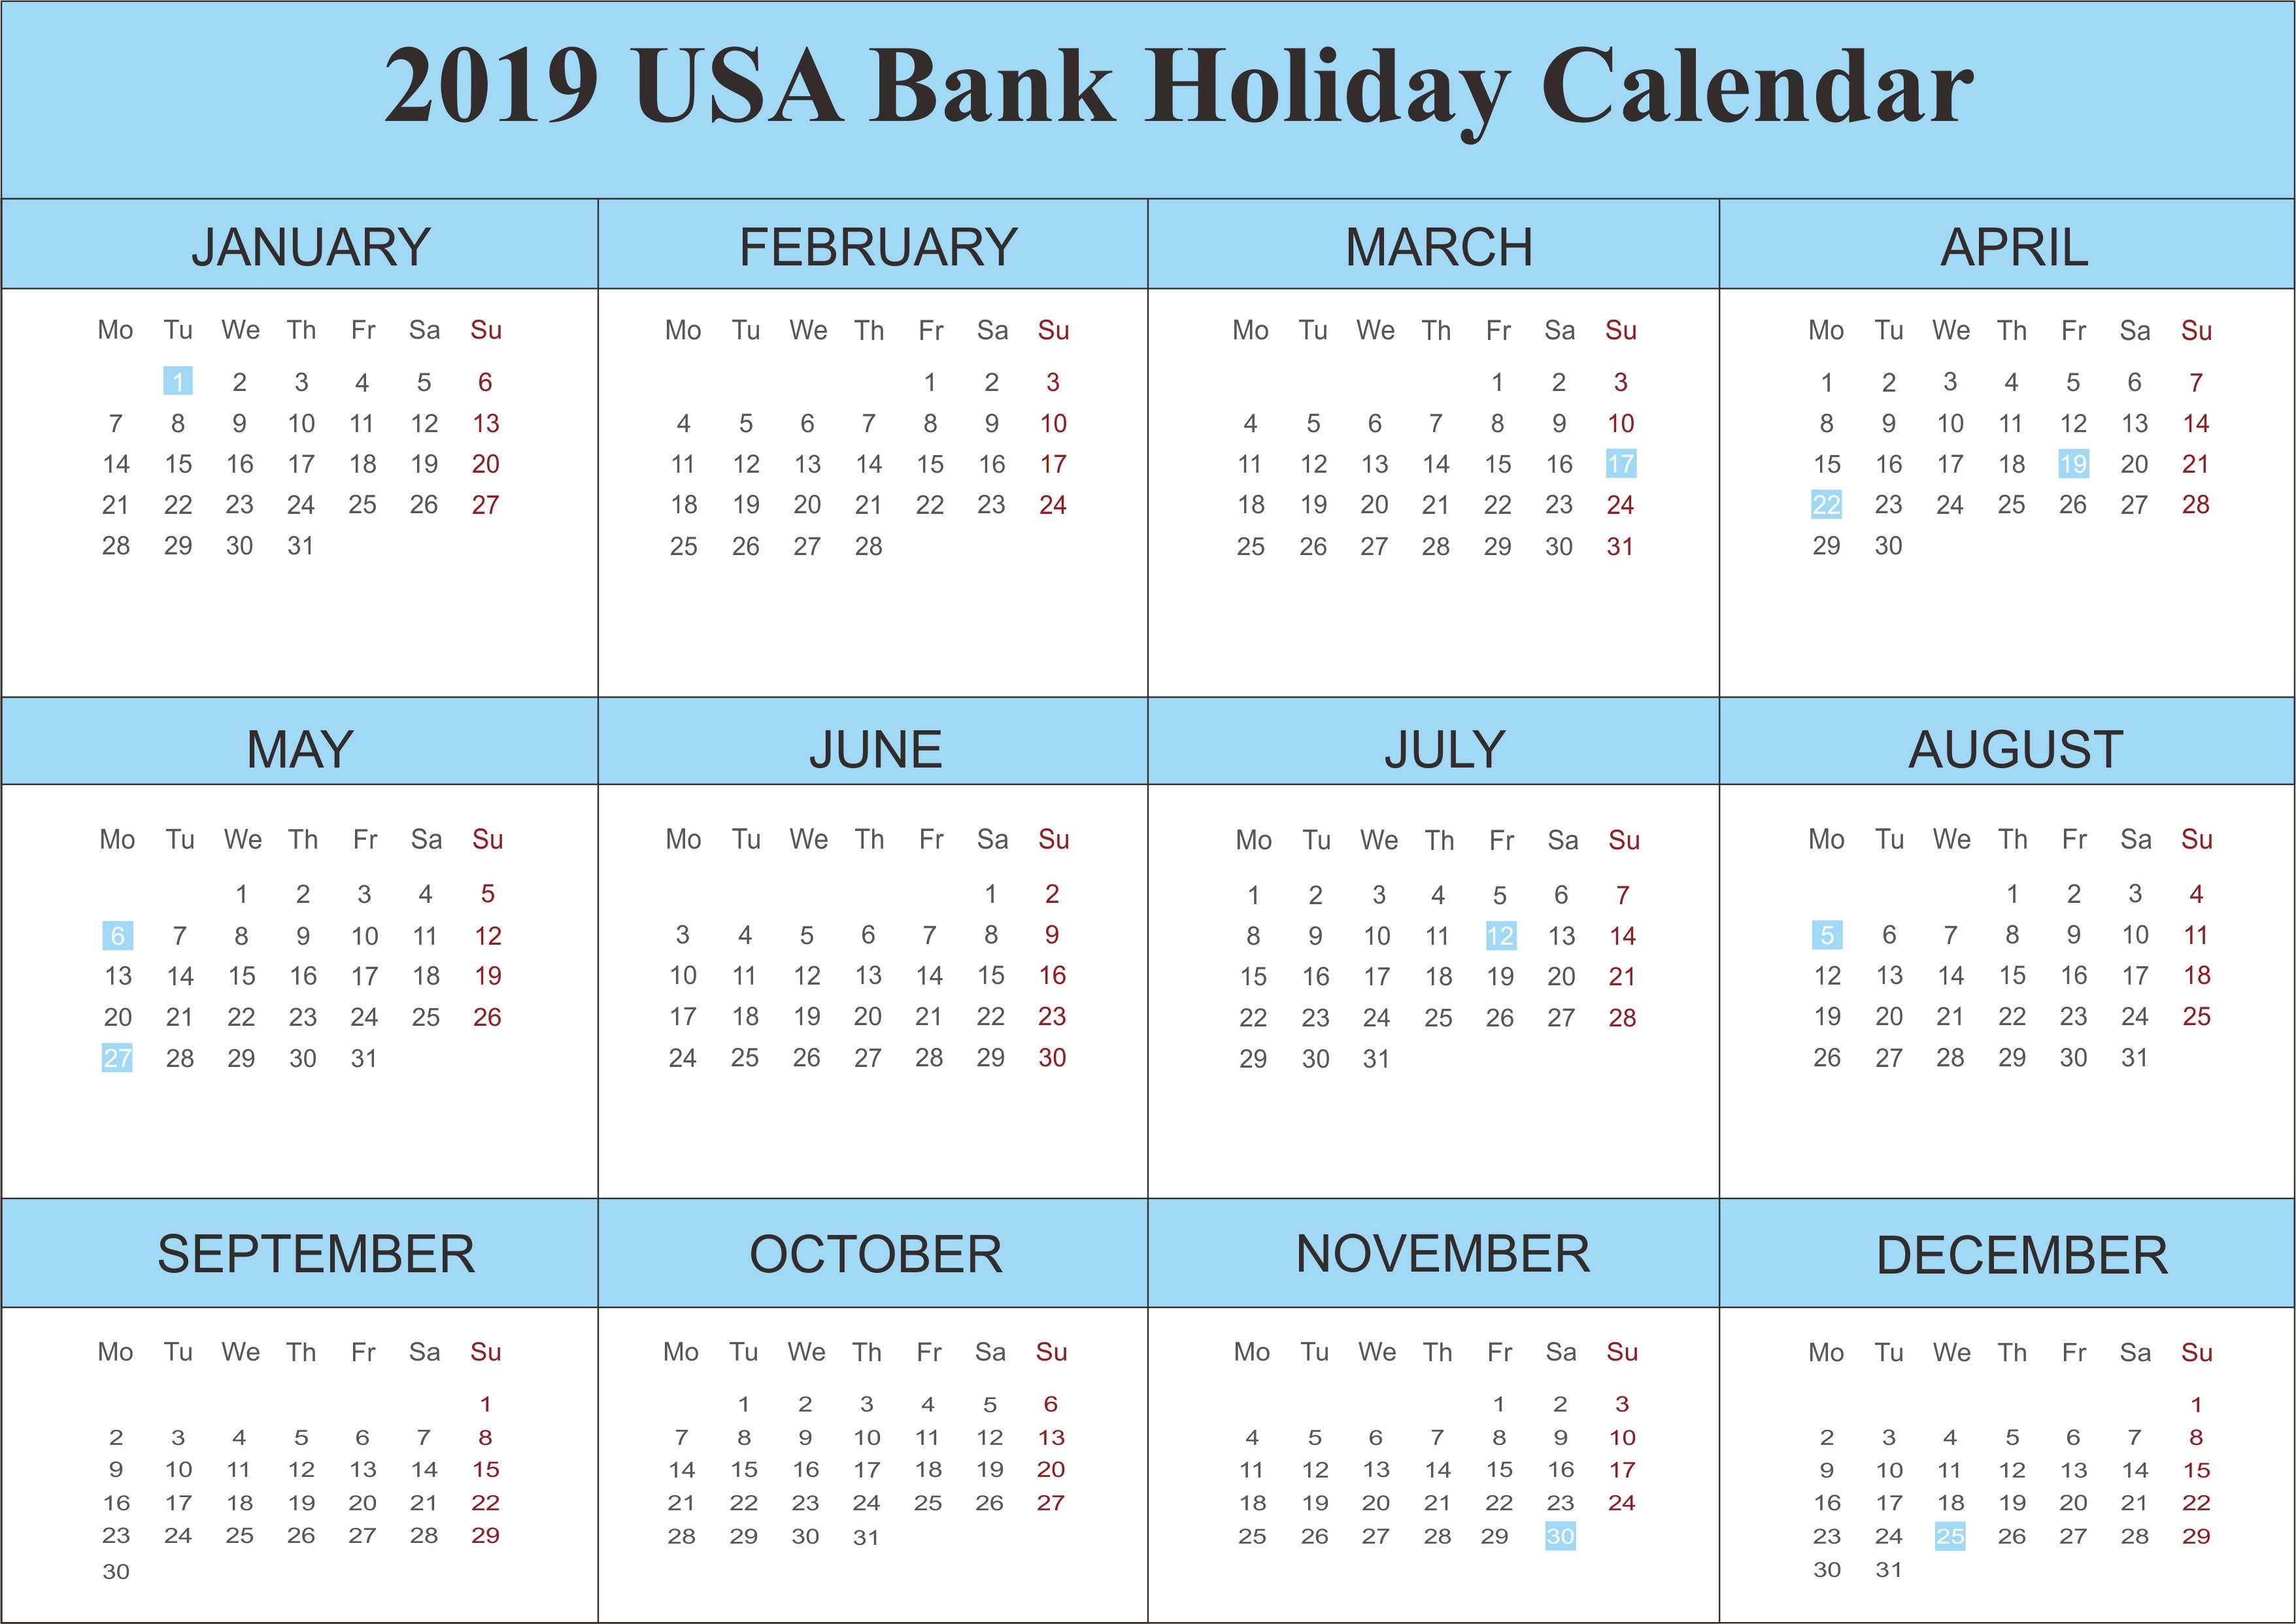 2019 Usa Bank Holidays Calendar | 250+ Free Monthly Calendar Calendar 2019 Bank Holidays